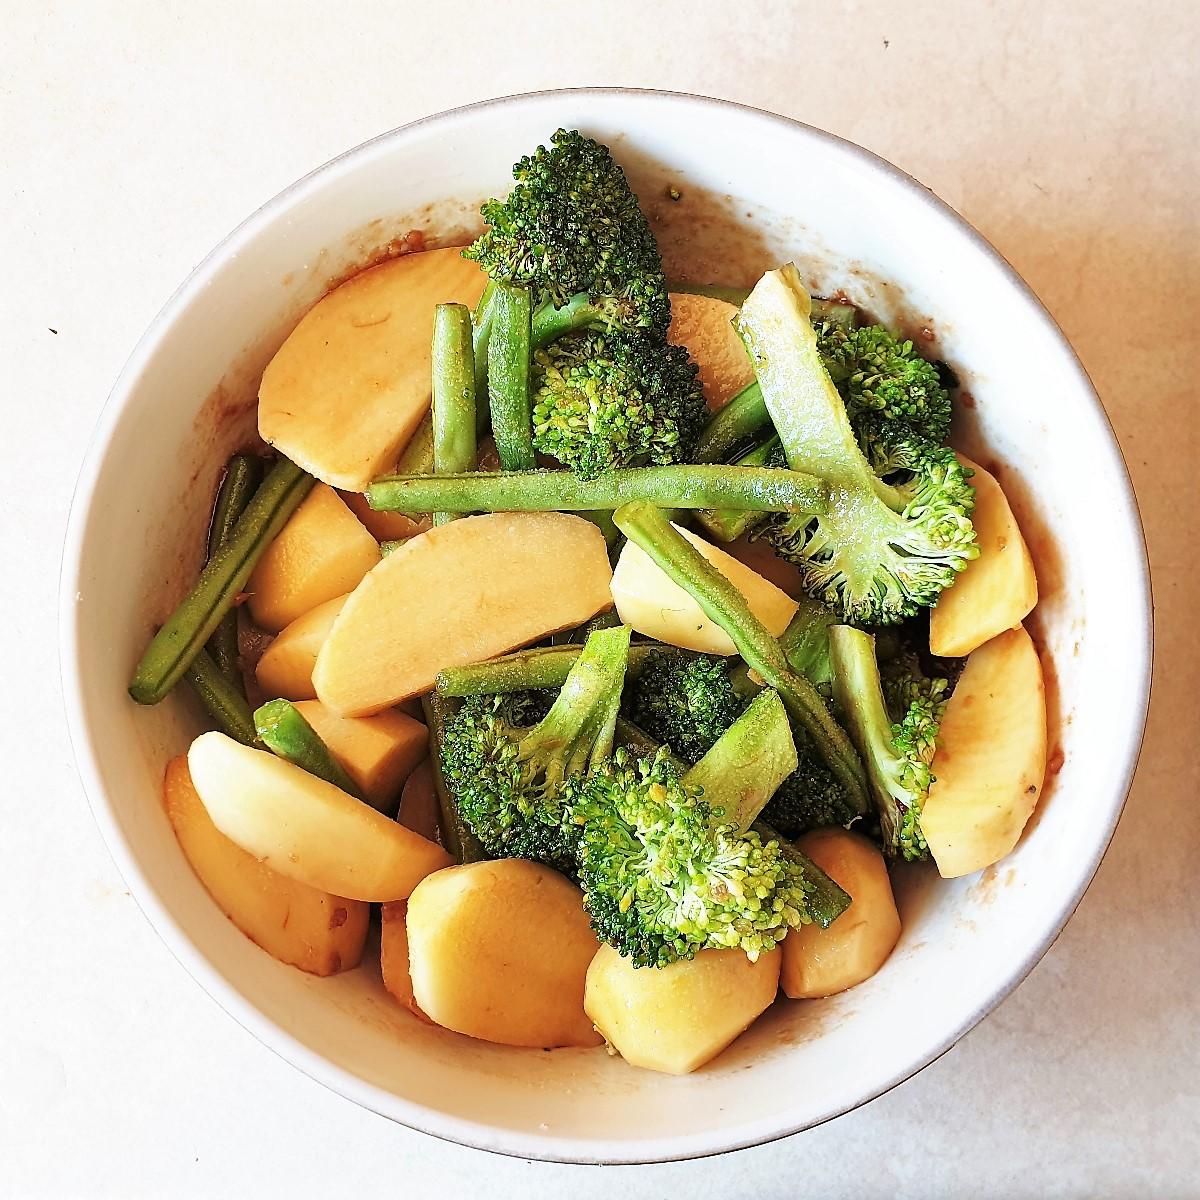 A bowl of potatoes, broccoli and green beans mixed with honey garlic marinade.